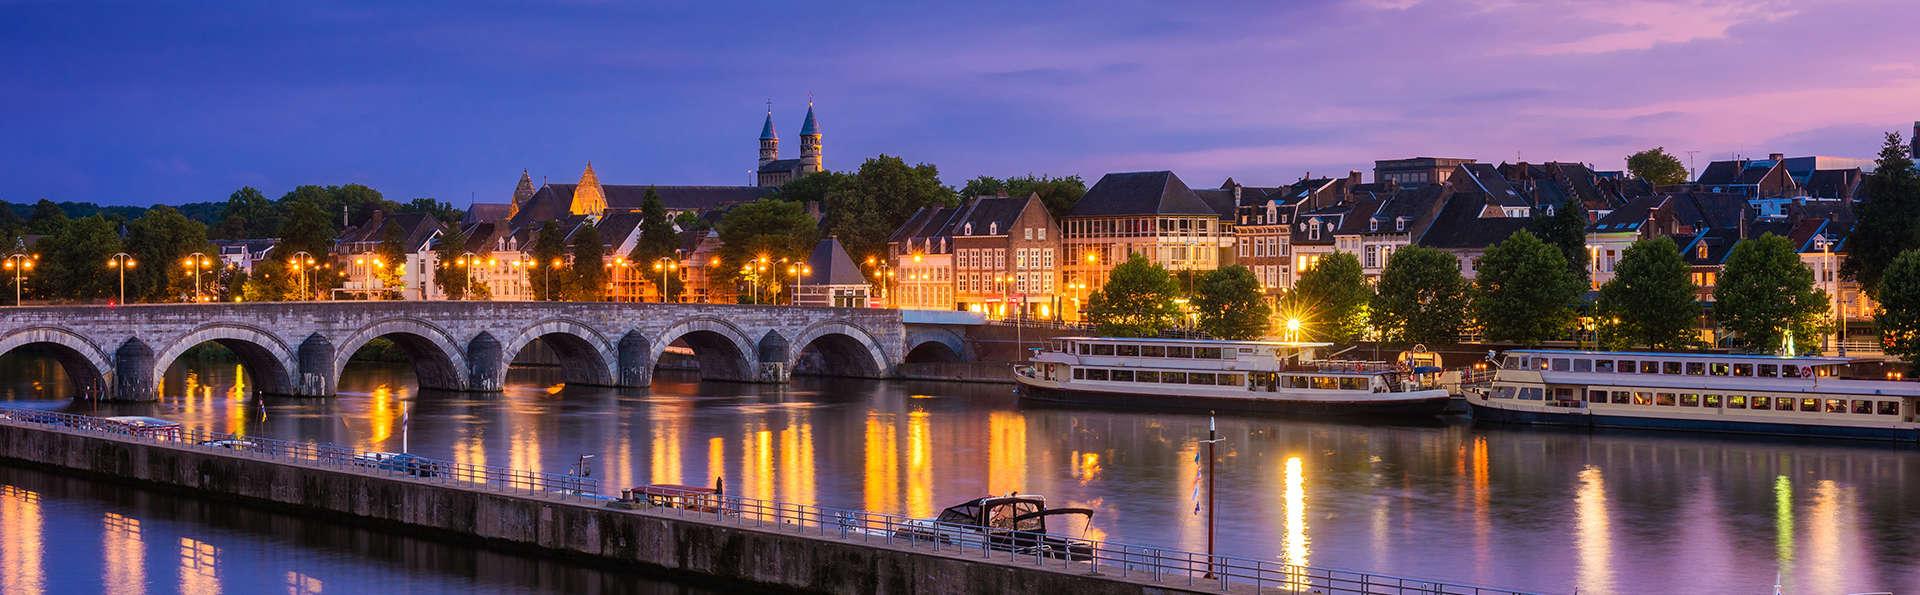 Hotel Maastricht City Centre - EDIT_MAASTRICHT15.jpg